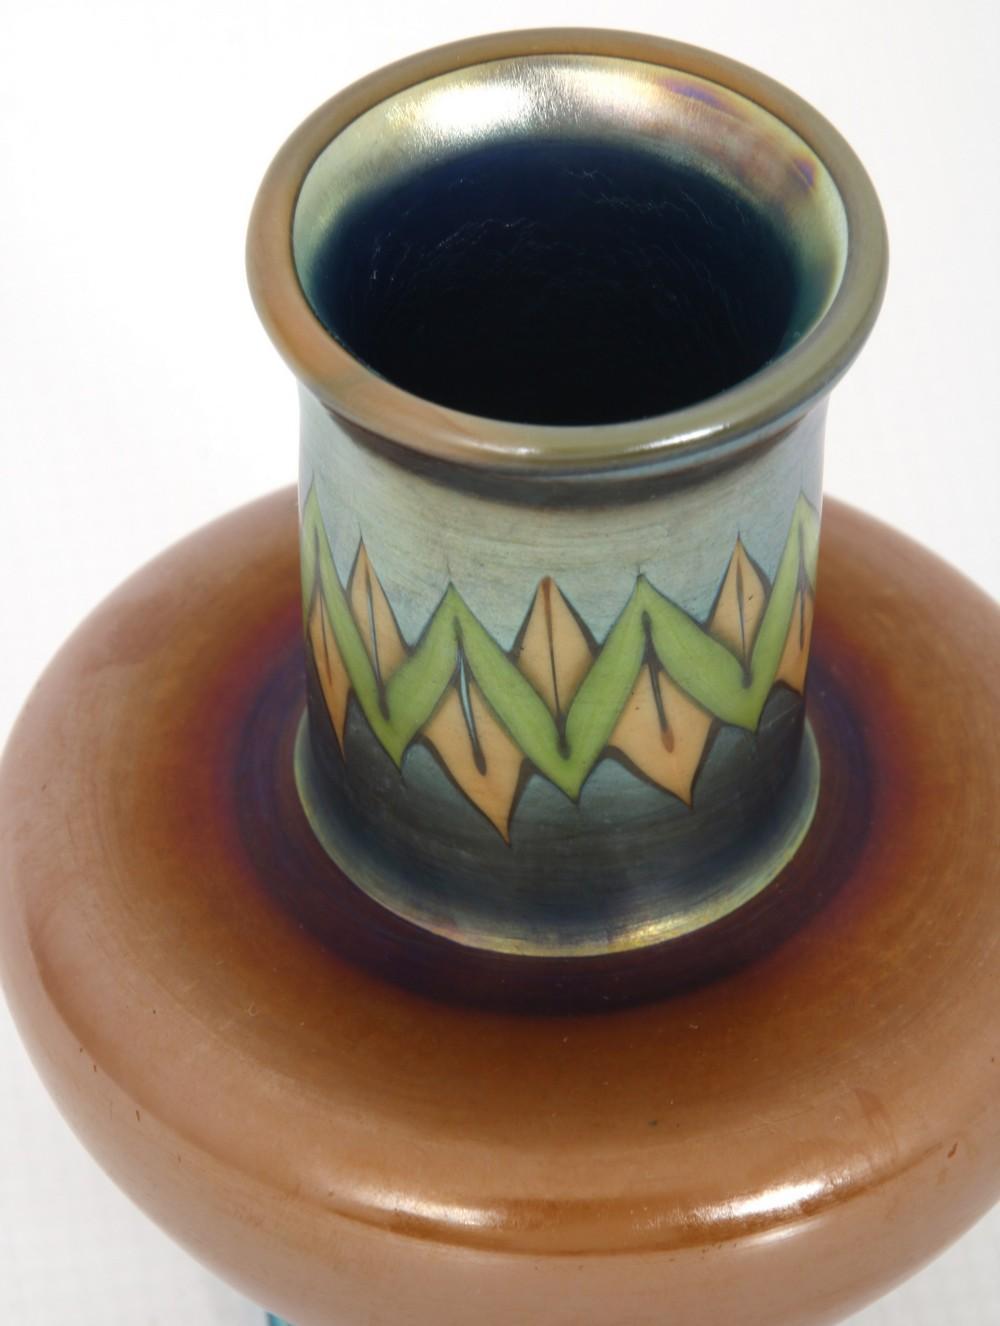 Tiffany Studios Tel El Amarna Vase